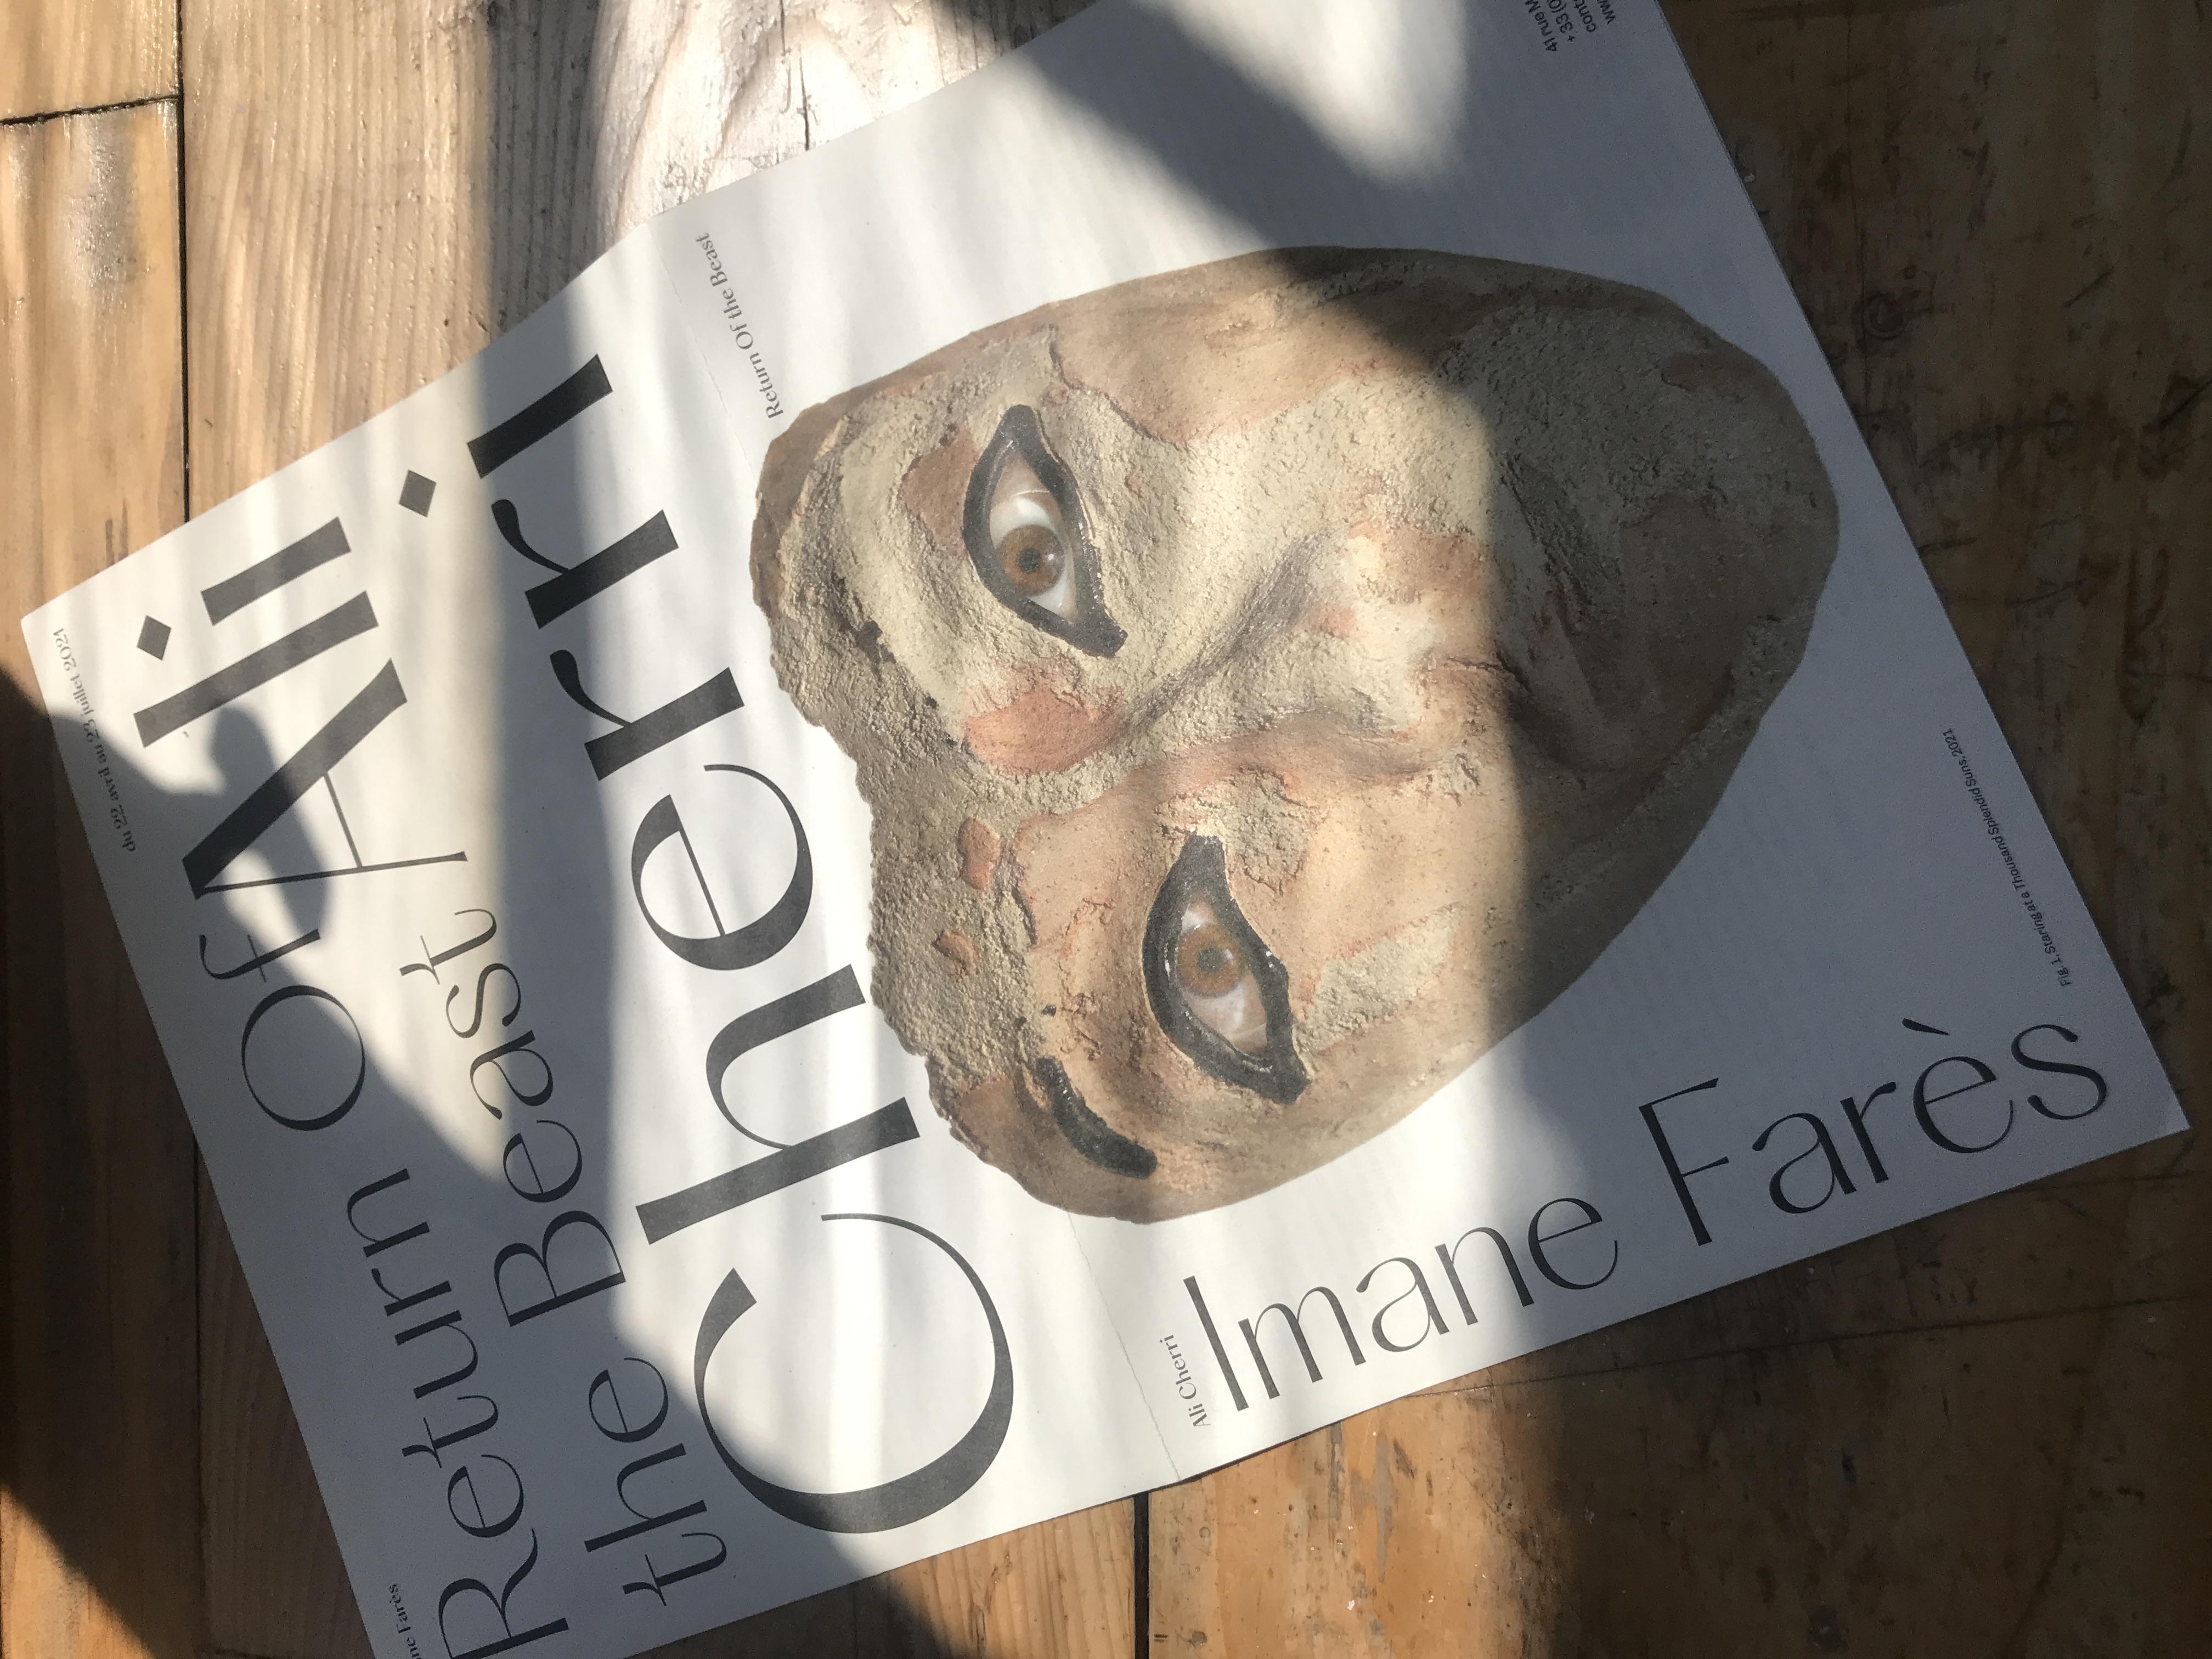 Cyril Makhoul - Imane Farès — Newspaper for Ali Cherri's exhibition